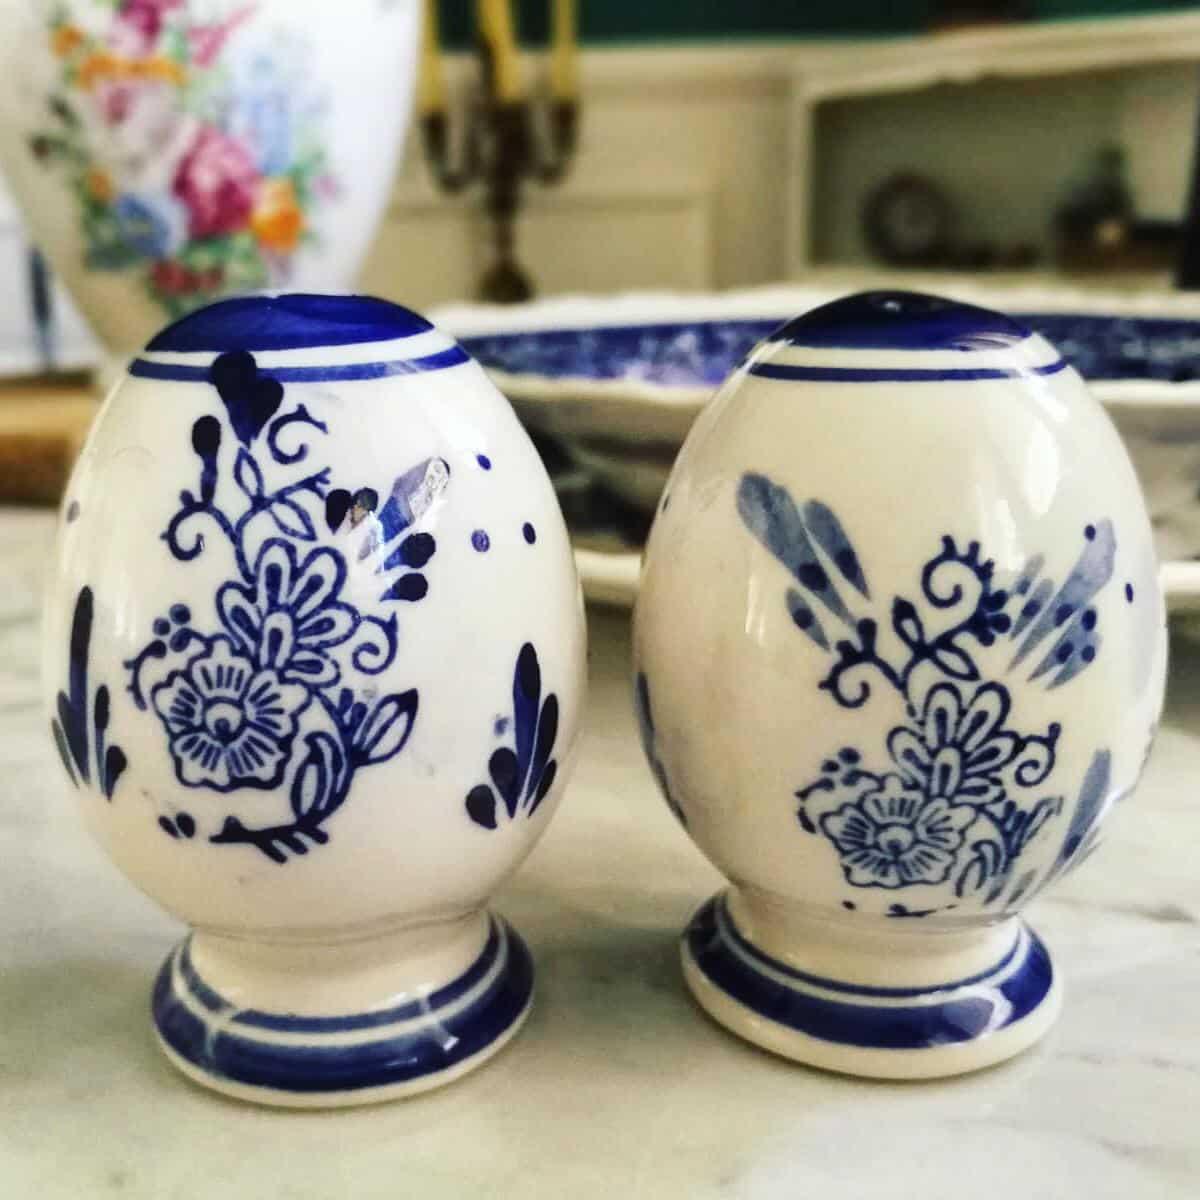 sale e pepe ceramica bianca e decori blu vintage